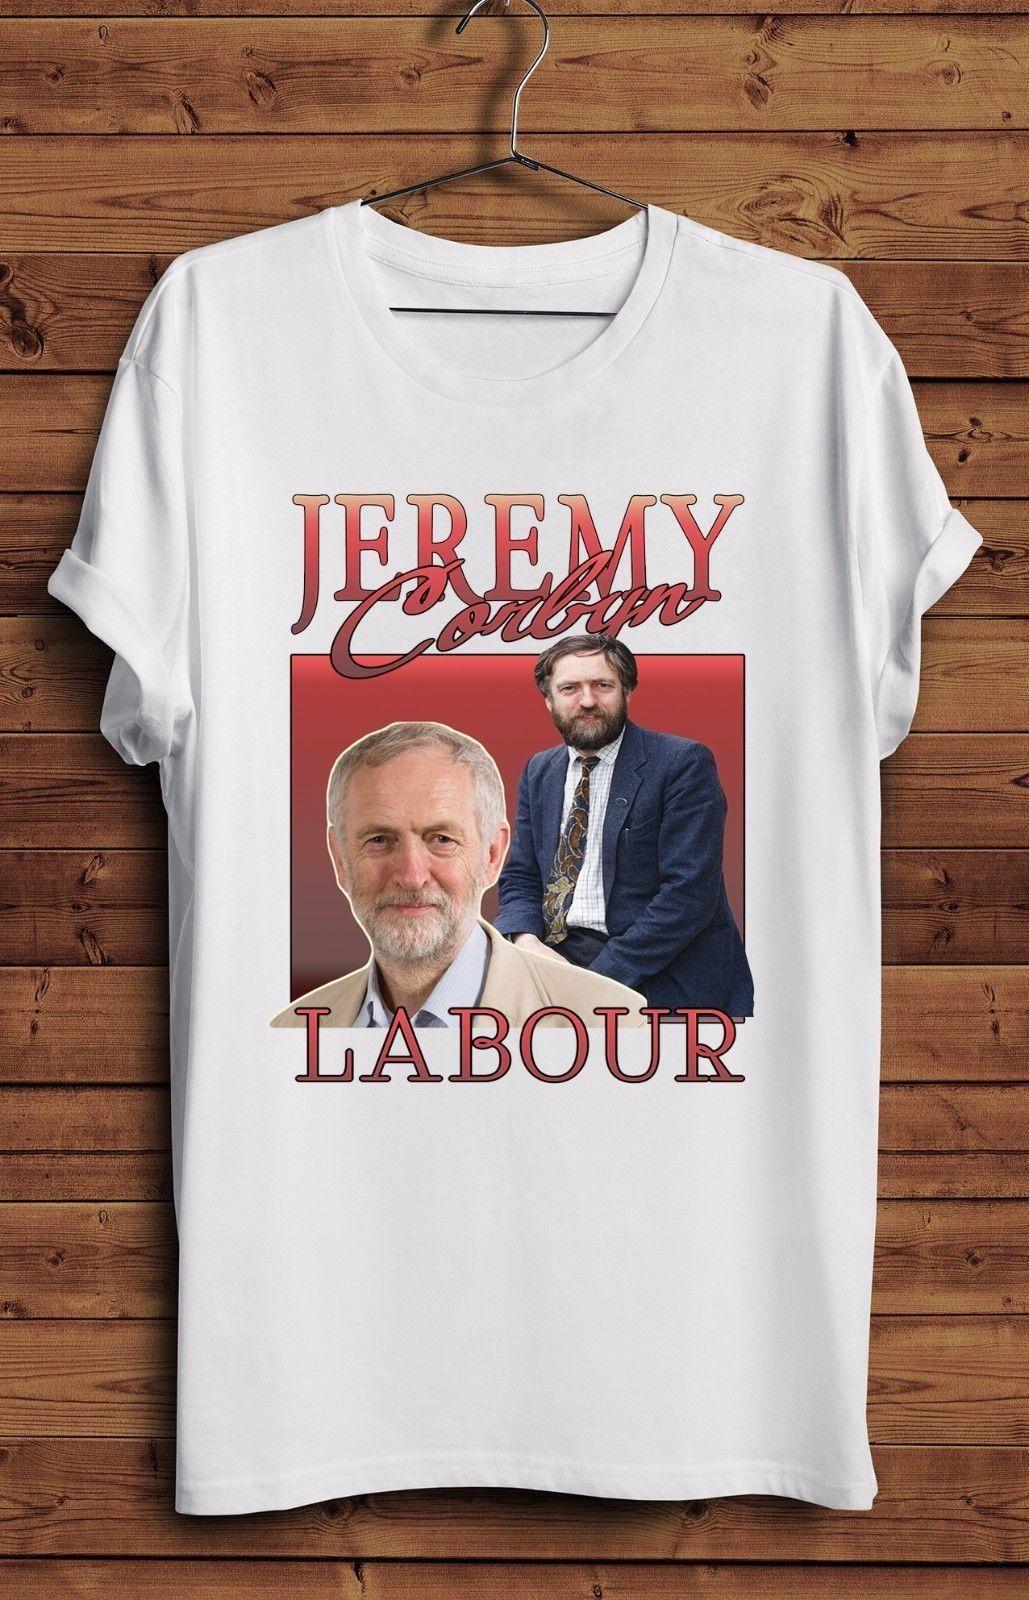 56e2431c99 Jeremy Corbyn Labour Vintage Party T Shirt Homage UK Parody Politics MP  Momentum New 2018 Summer Style T Shirt Shirt Custom T Shirts From Shitan9,  ...